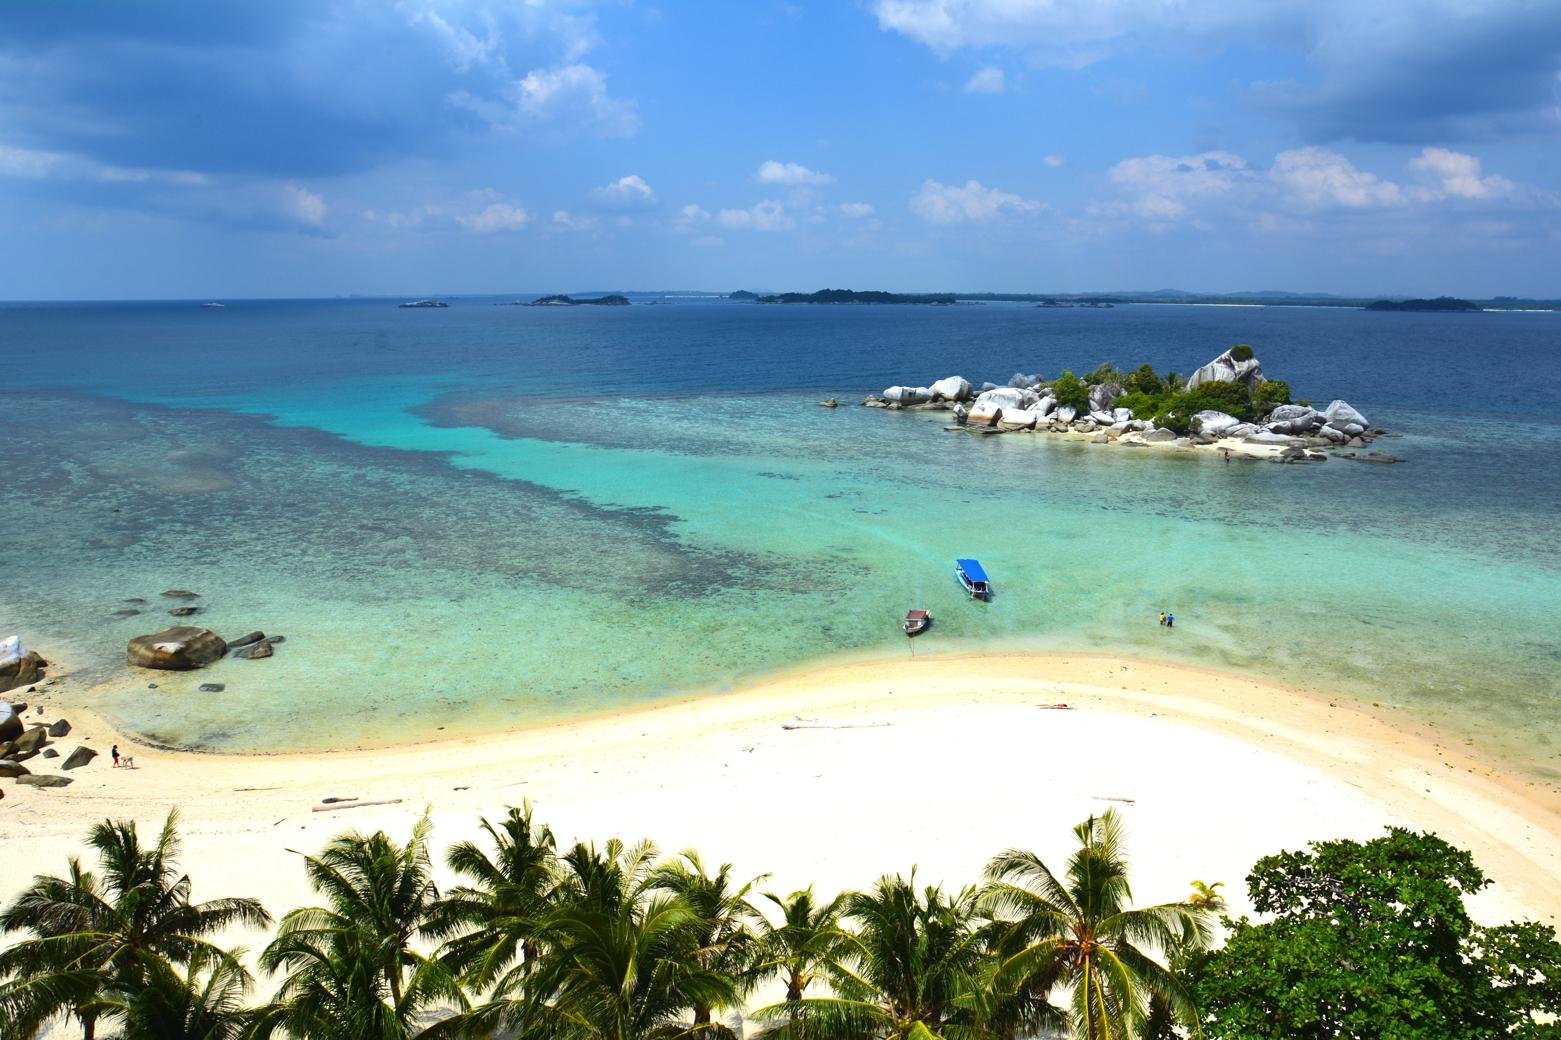 Belitung-sziget partvidéke